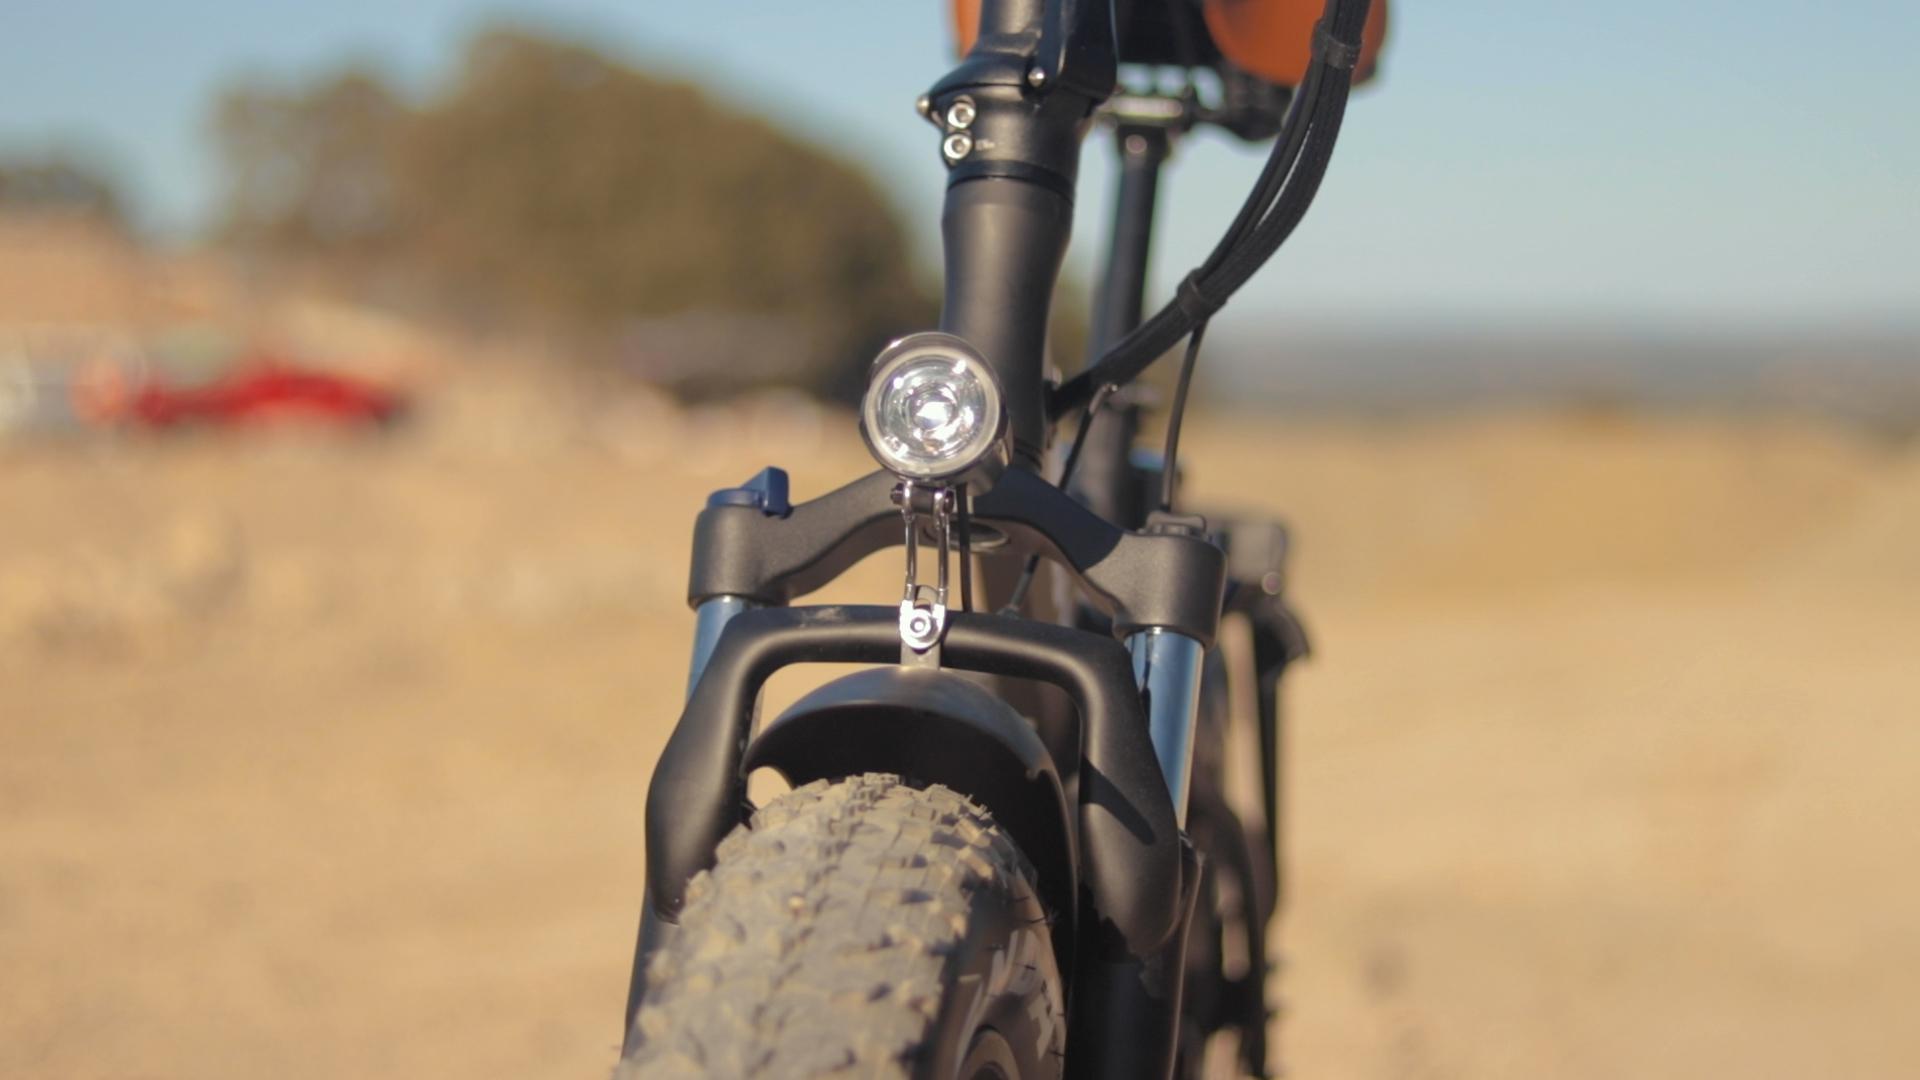 electrified-reviews-bagibike-b20-premium-electric-bike-review-headlight.jpg